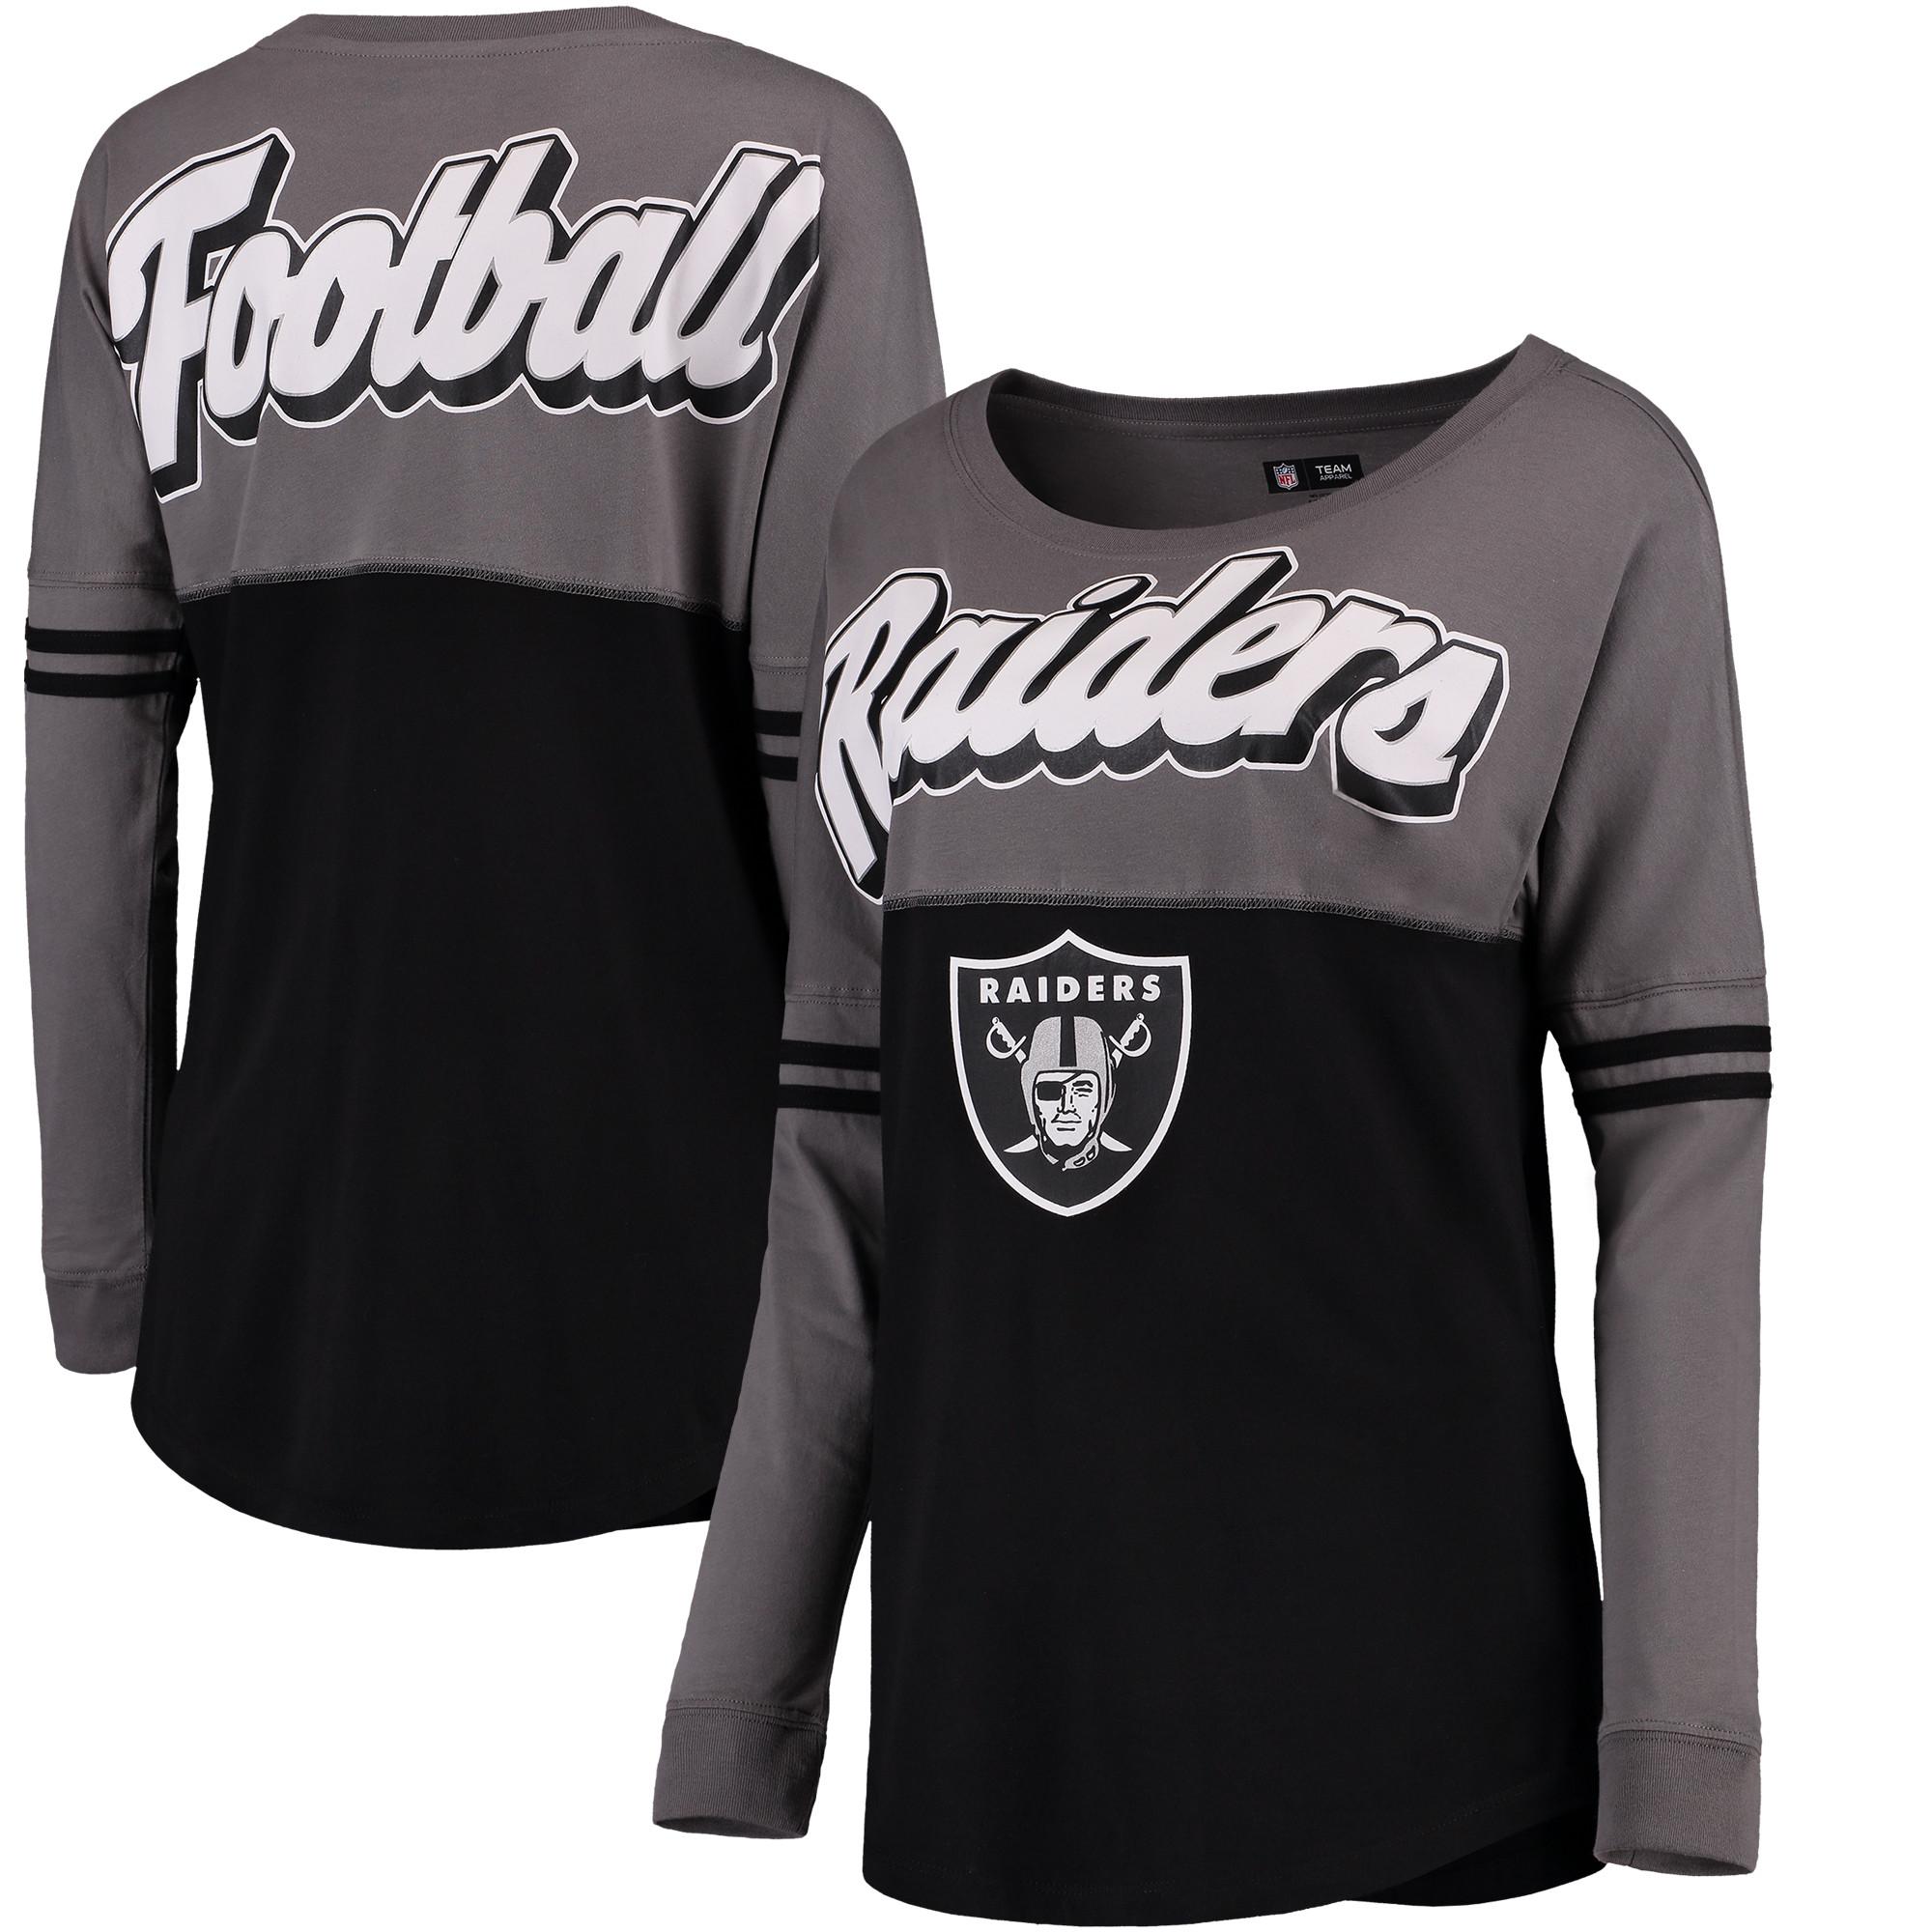 Oakland Raiders 5th & Ocean by New Era Women's Athletic Varsity Long Sleeve T-Shirt - Charcoal/Black